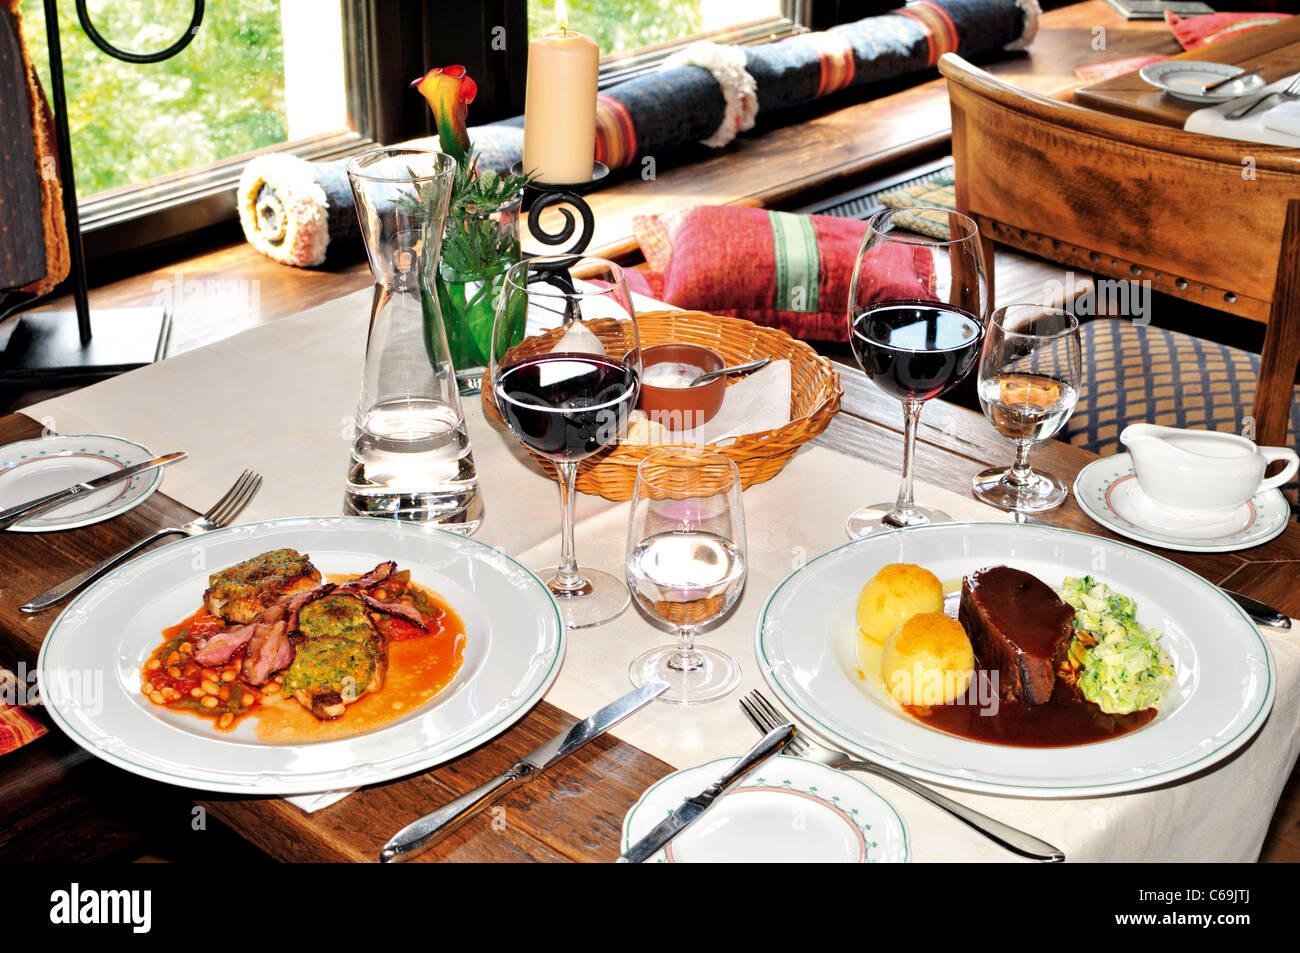 Germany, Eisenach: Lunch with regional specialties in the Hotel Auf der Wartburg - Stock Image